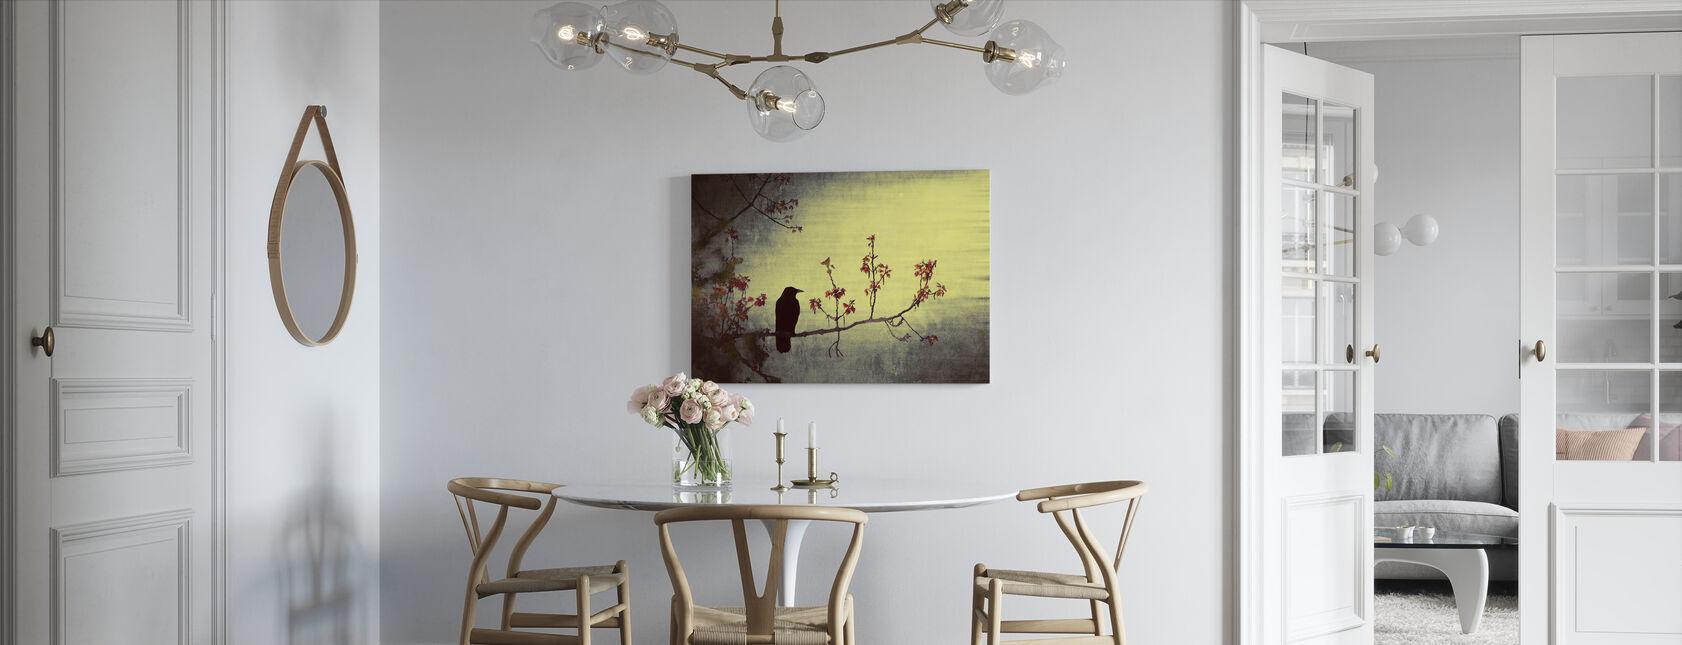 Crow on Flowering Branch - Canvas print - Kitchen